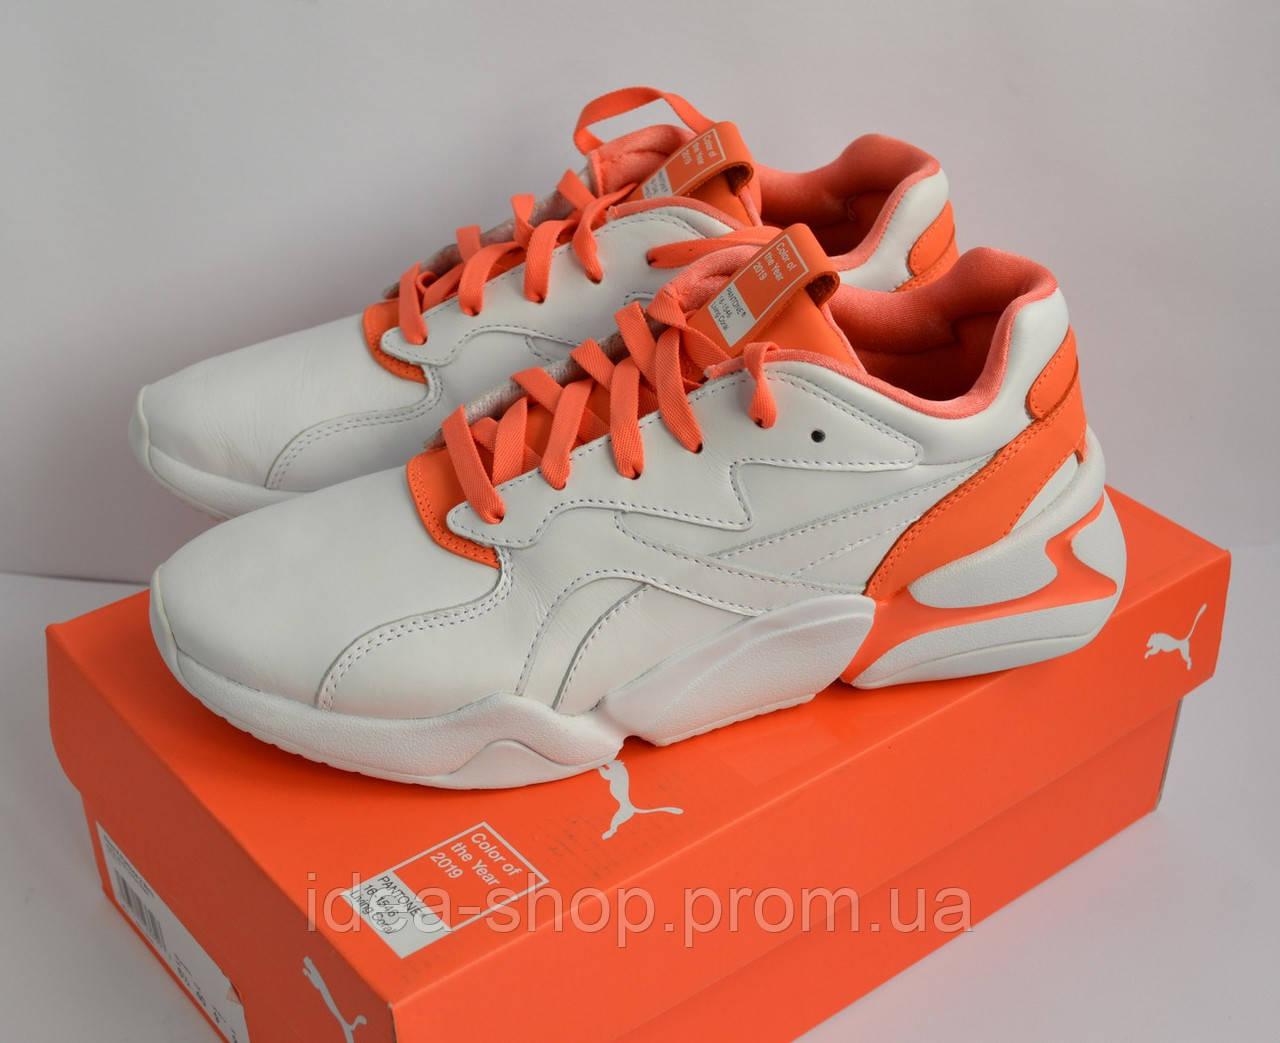 PUMA nova x pantone 2 women's sneakers